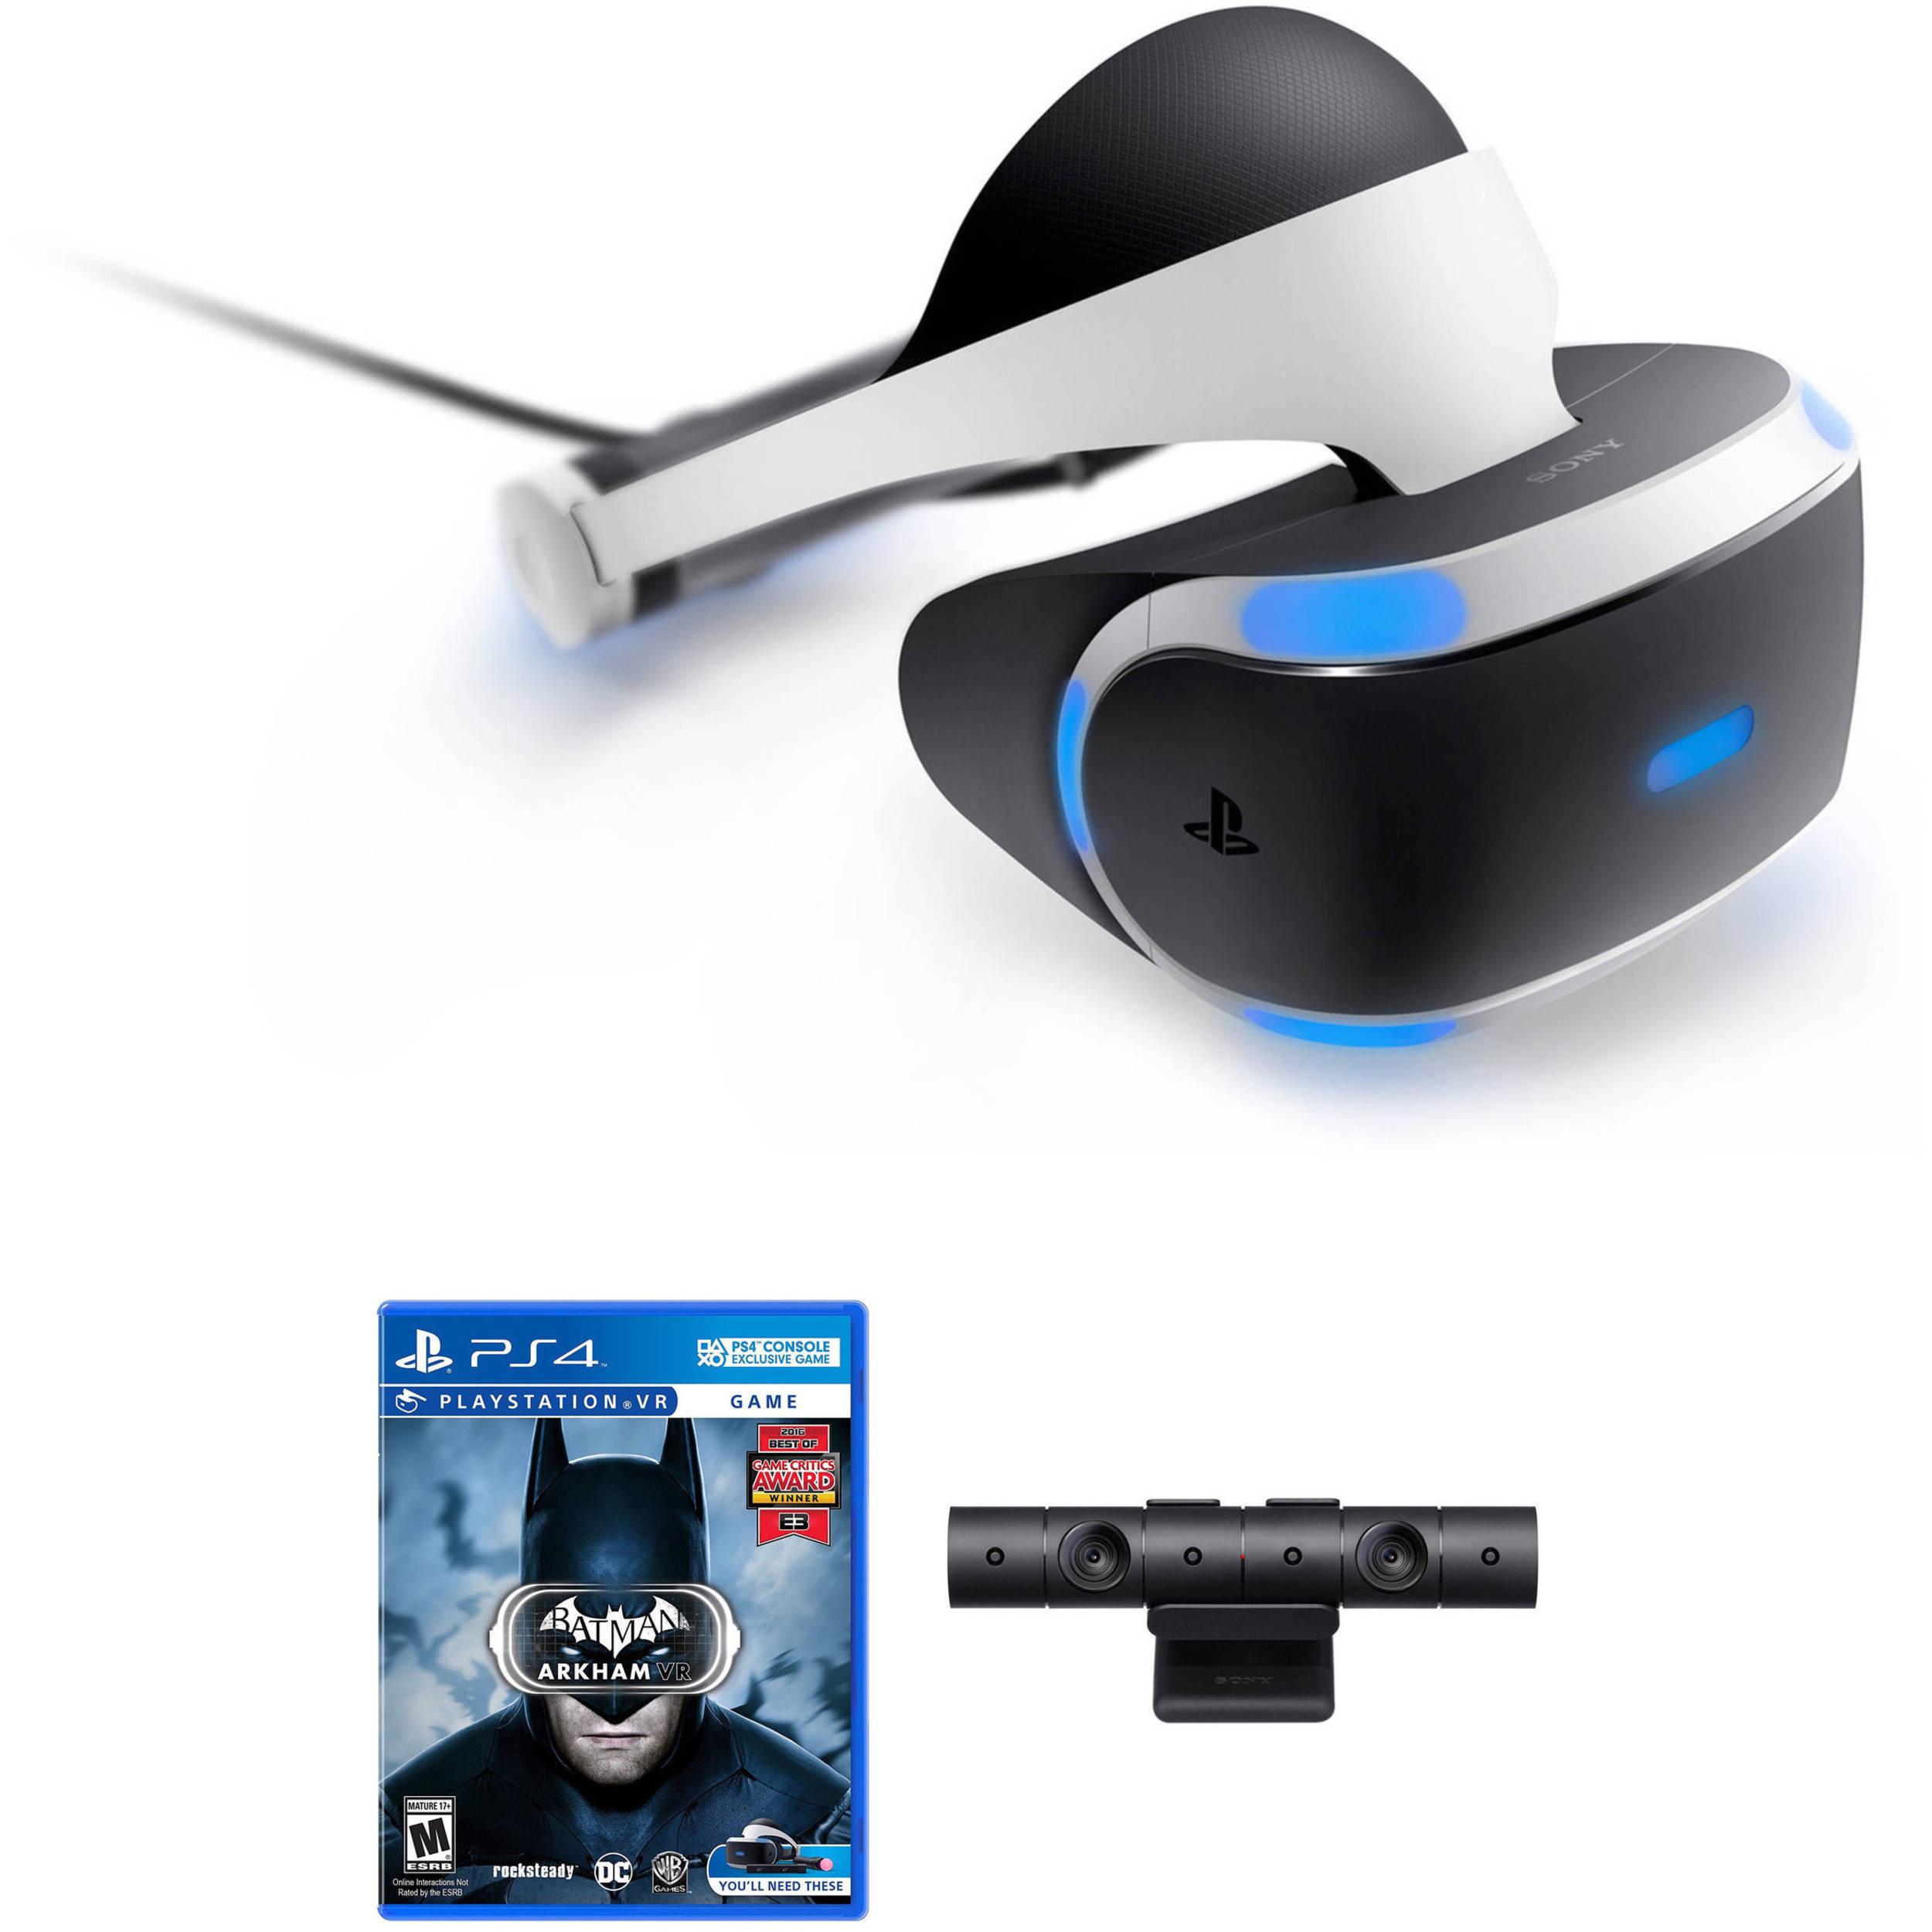 e3218a0ea Sony PlayStation VR Headset   Camera Kit with Batman  Arkham VR